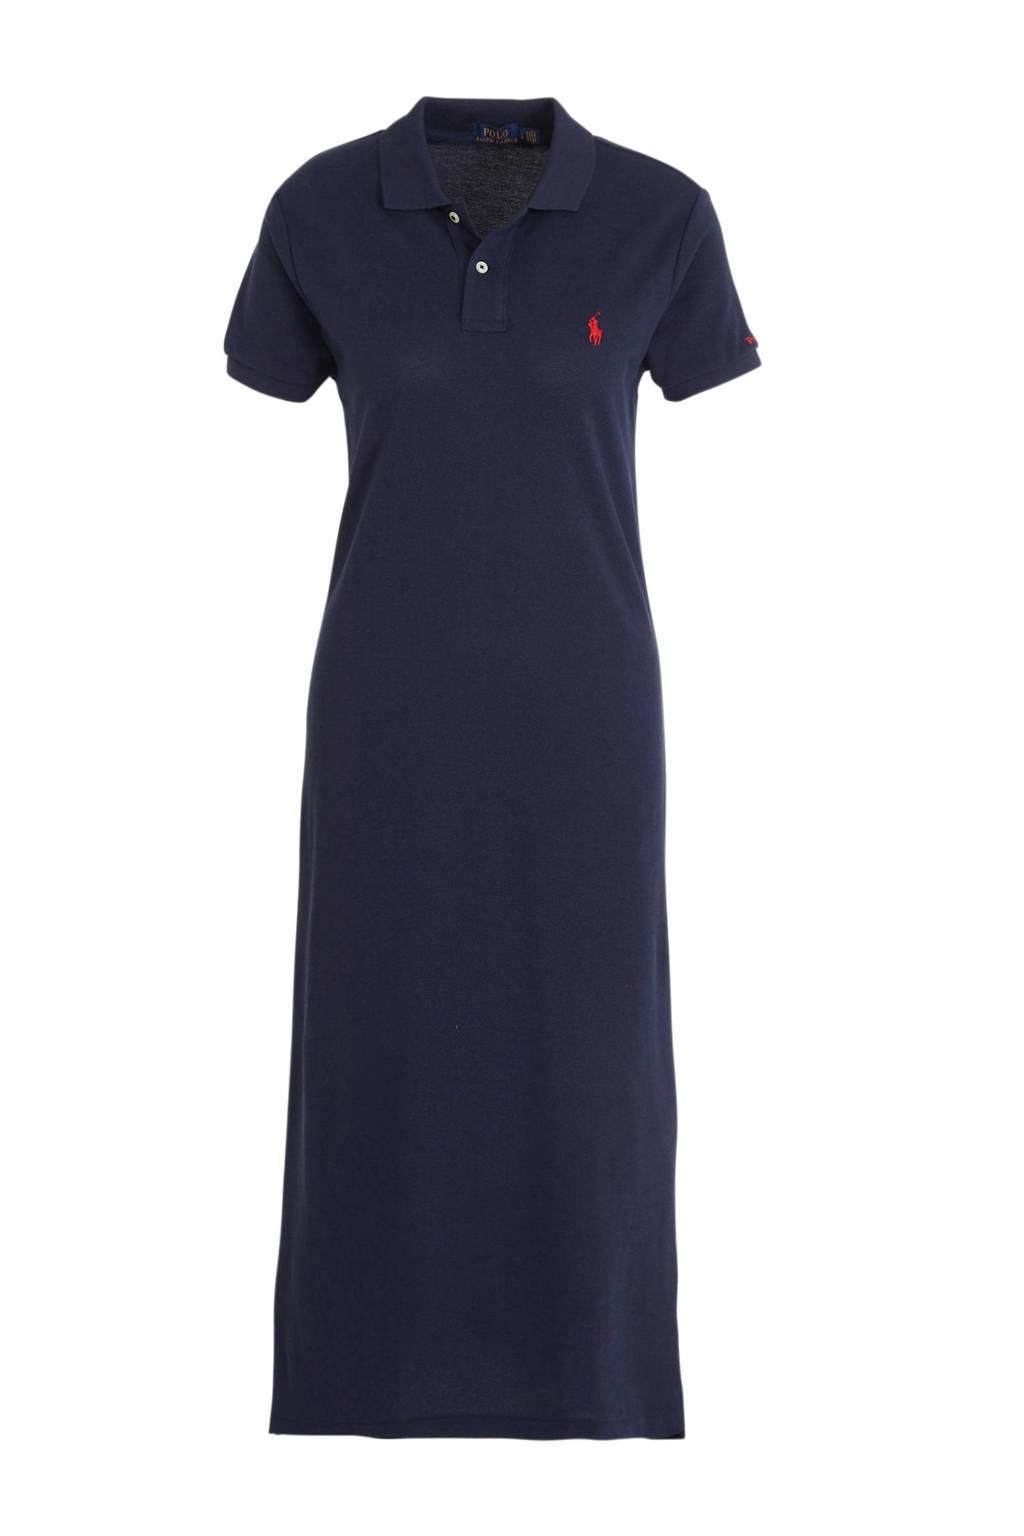 POLO Ralph Lauren maxi jurk donkerblauw, Donkerblauw